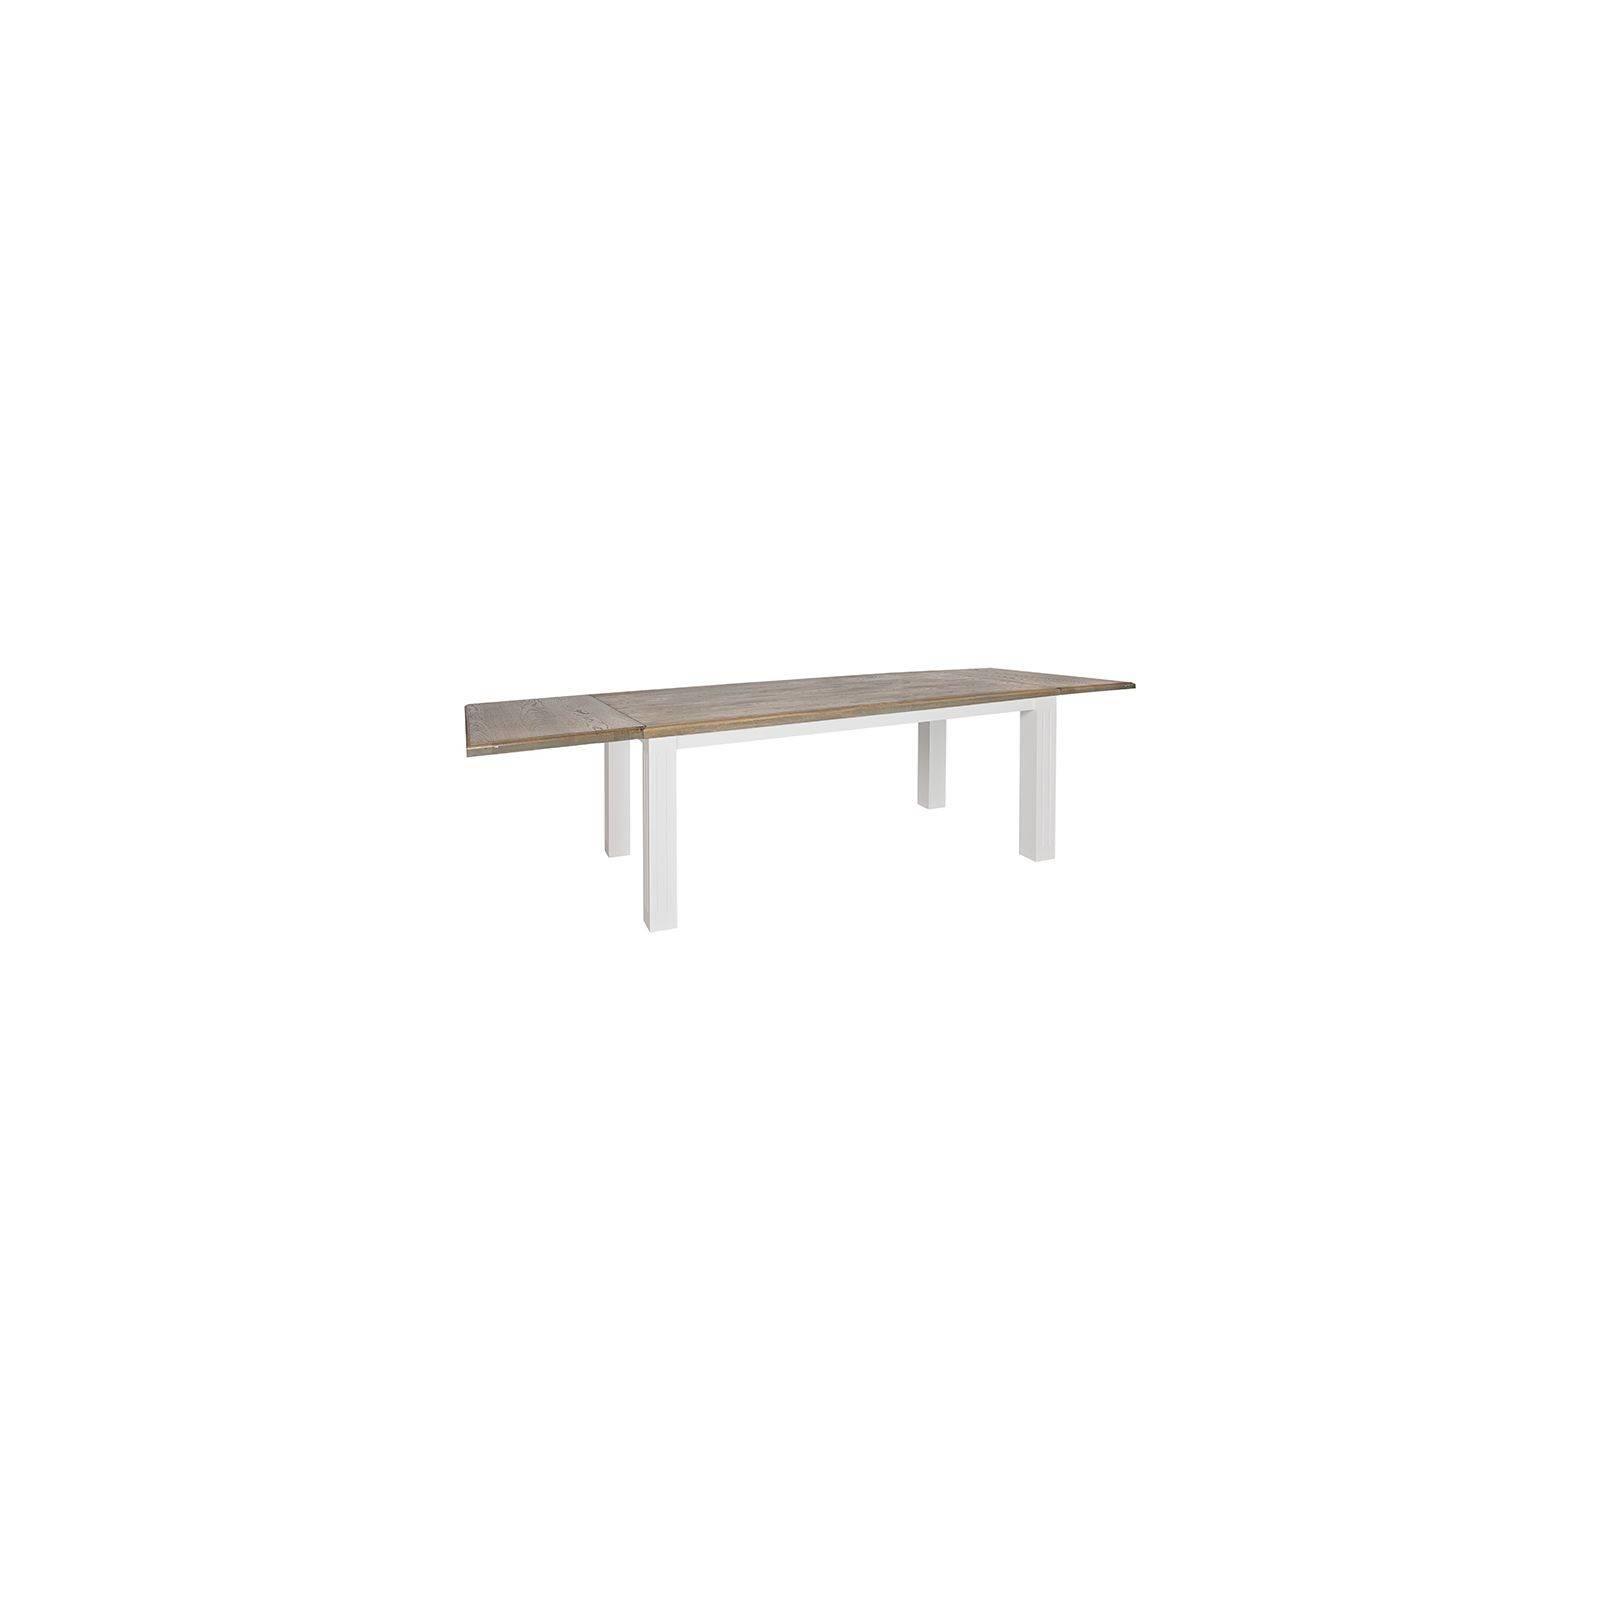 Table de salle rallonge Square Victoria Pin Massif - Meuble bois massif déco